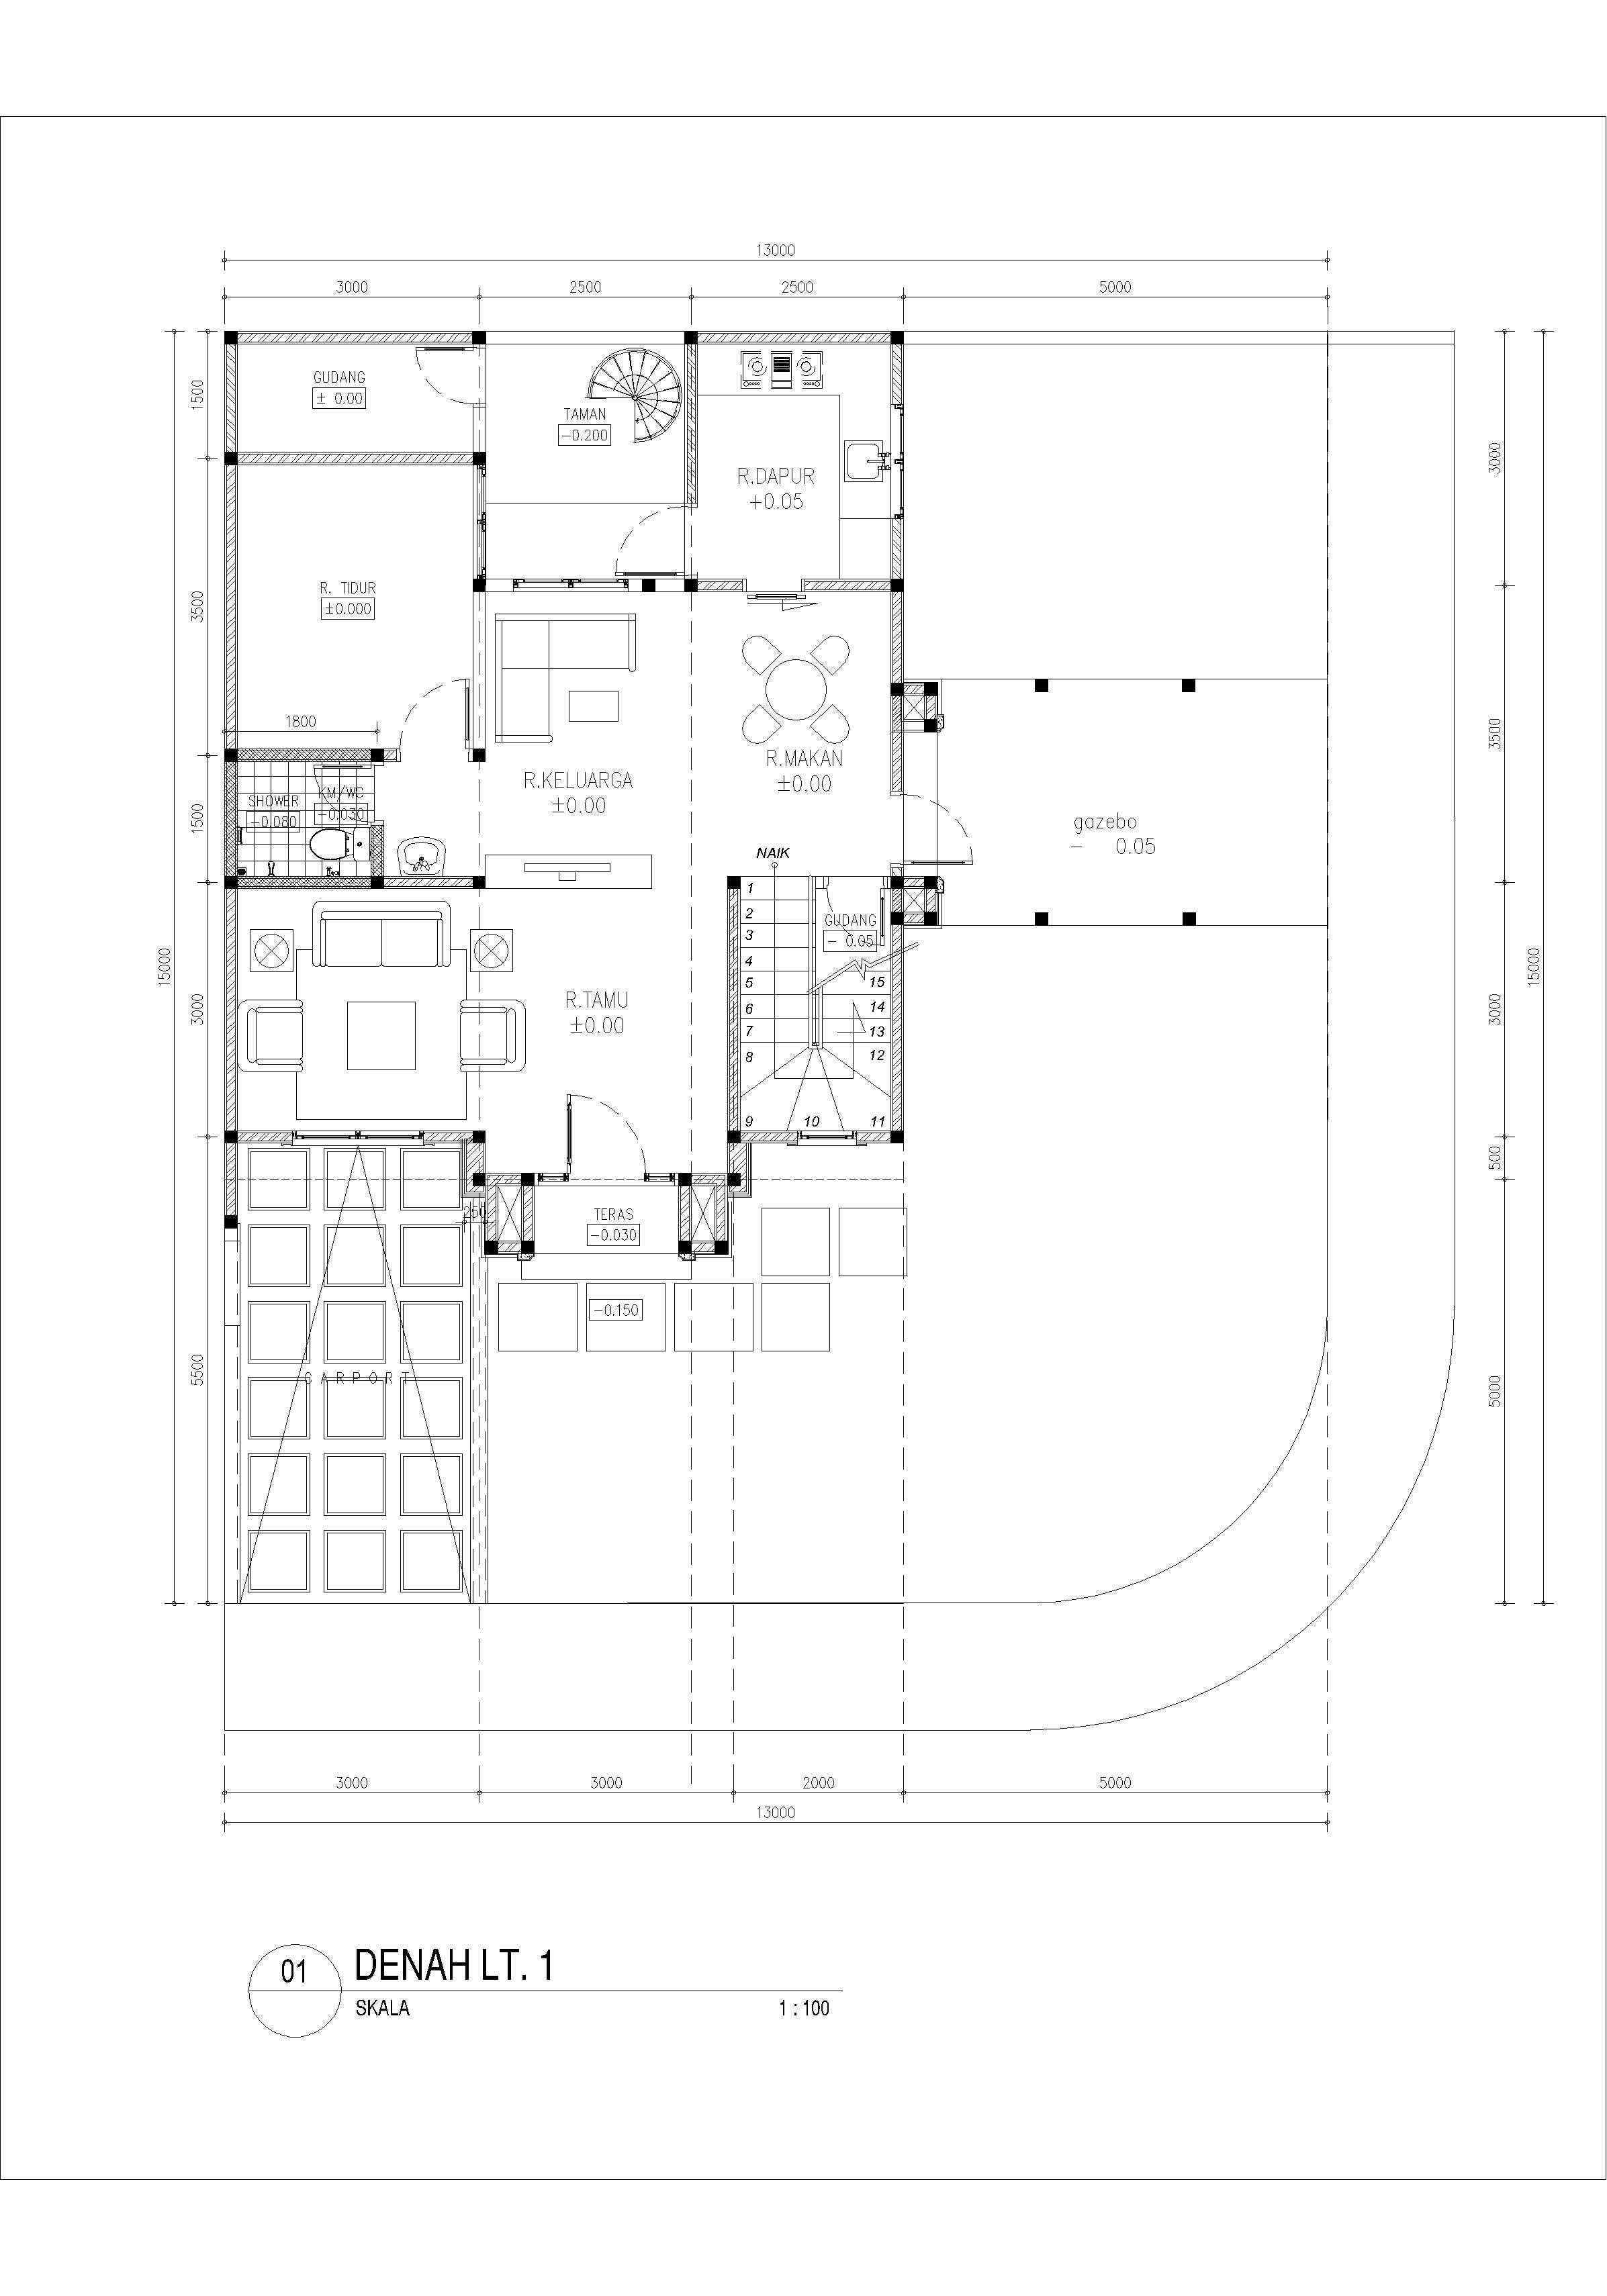 Yukatania Mandiri K Modern House Bandar Lampung, Kota Bandar Lampung, Lampung, Indonesia Bandar Lampung, Kota Bandar Lampung, Lampung, Indonesia Floorplan 1St Floor Modern  43758